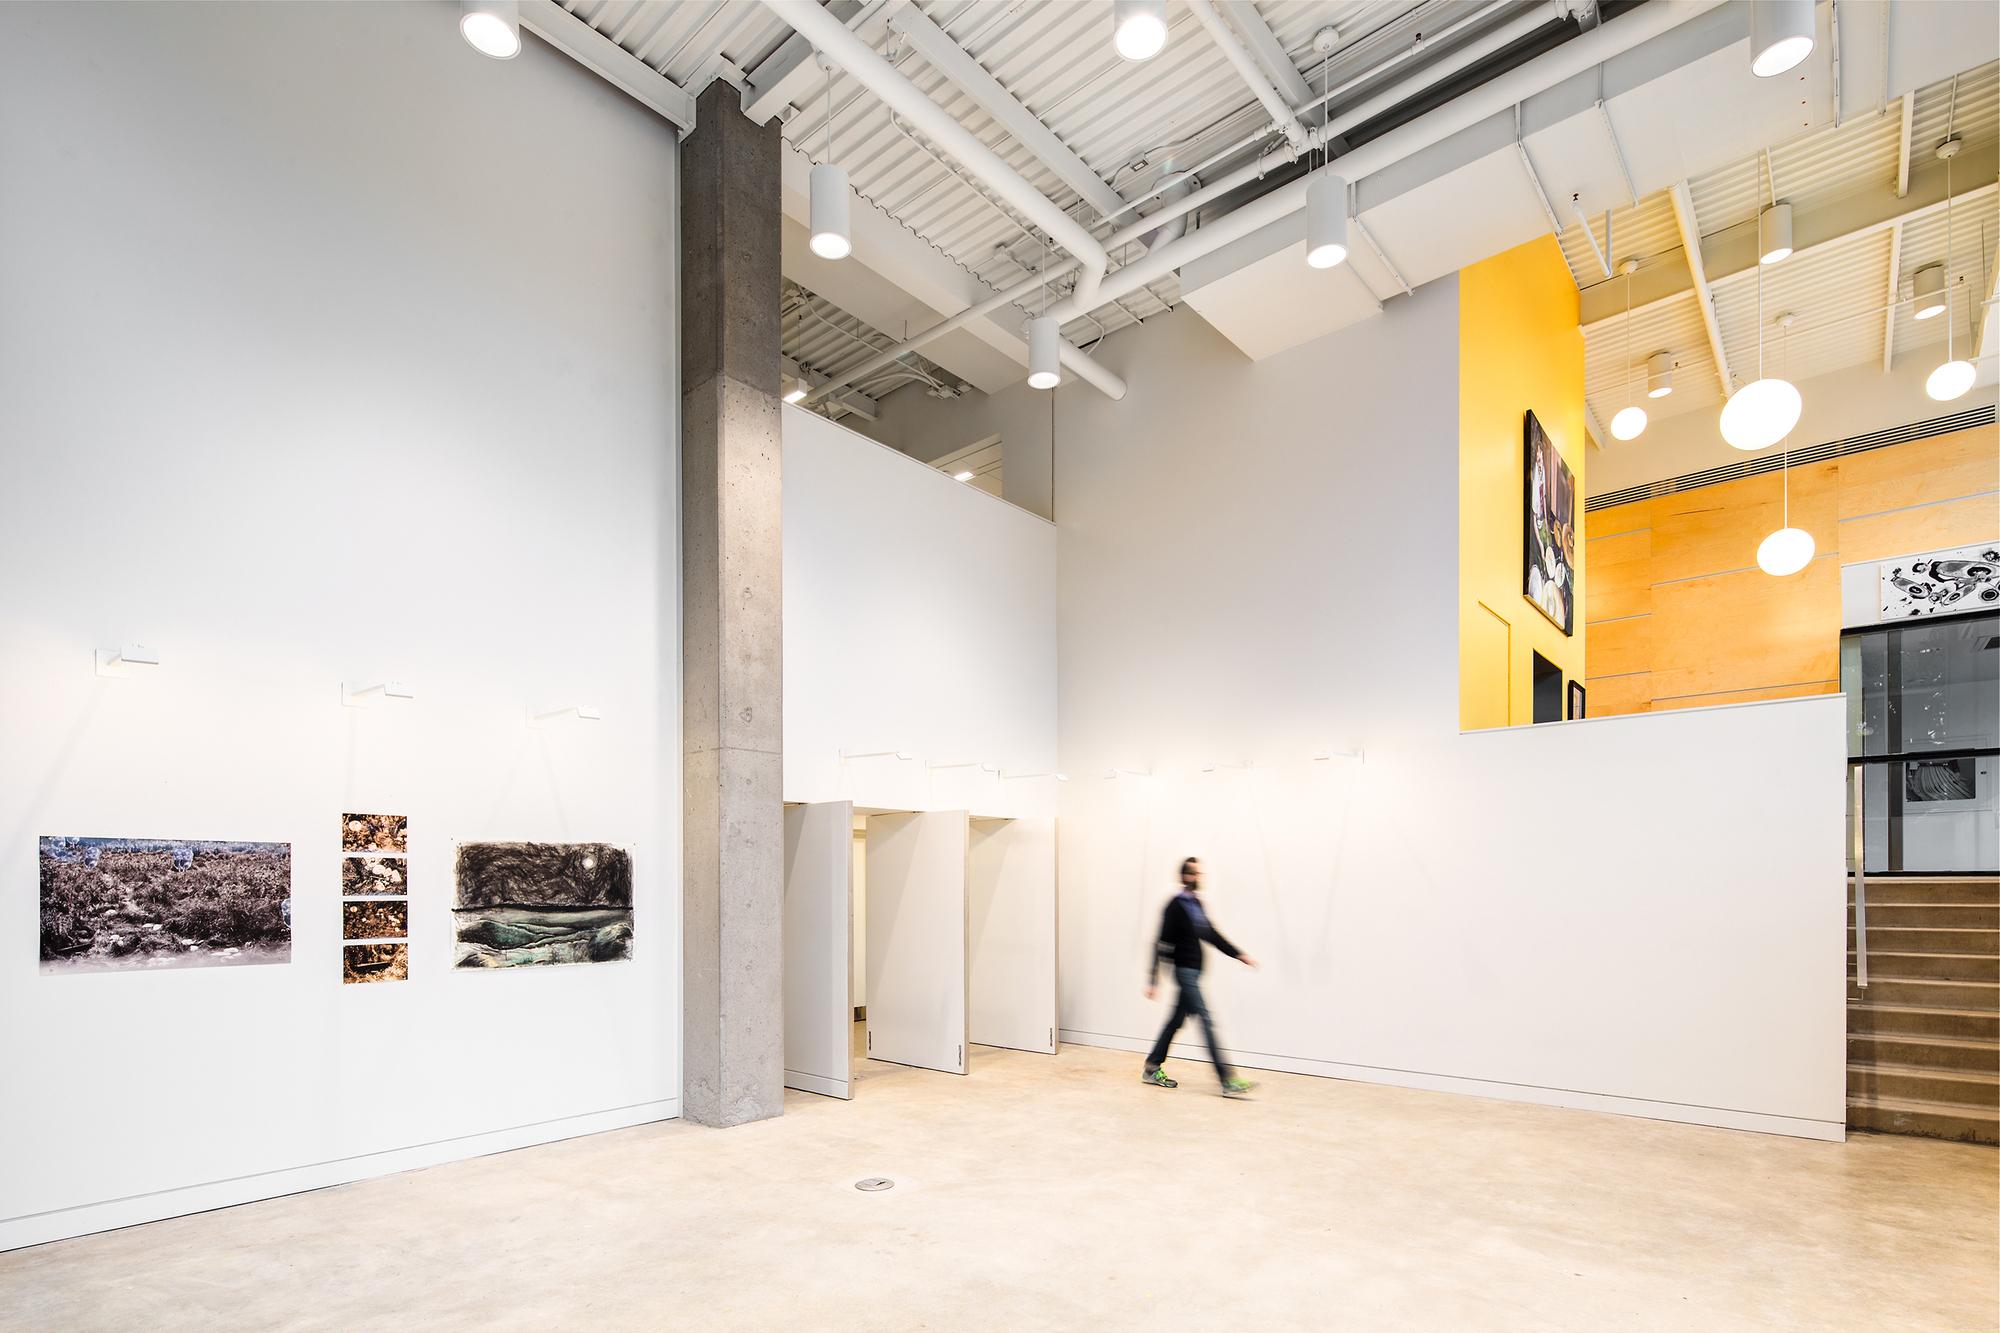 Fitzhenry studio atrium dpai architecture archdaily for Z architecture william vassal